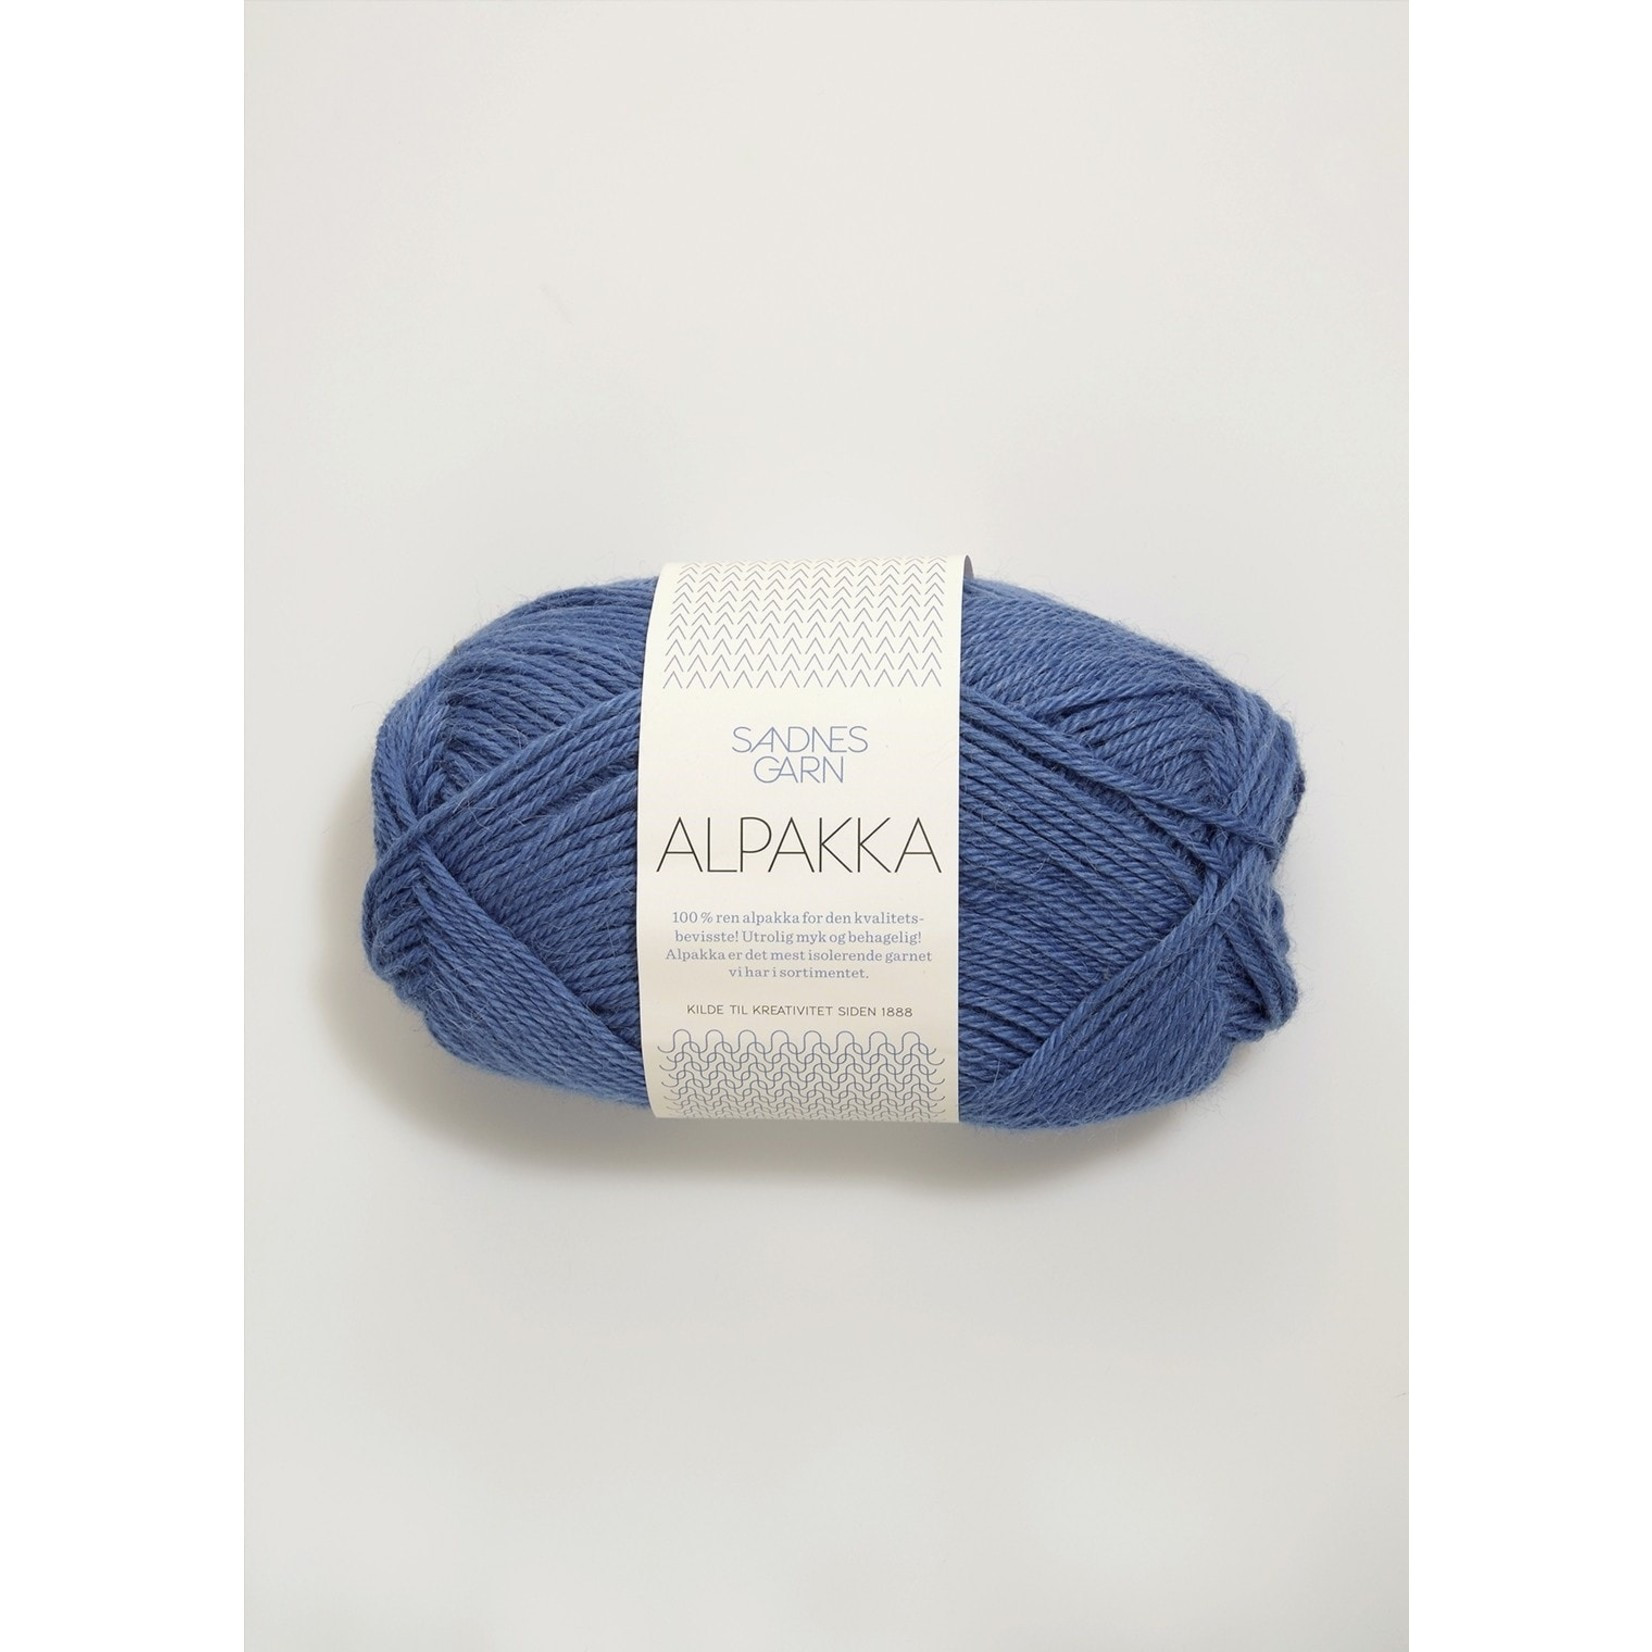 Sandnes Garn Alpakka, 6053, Blue